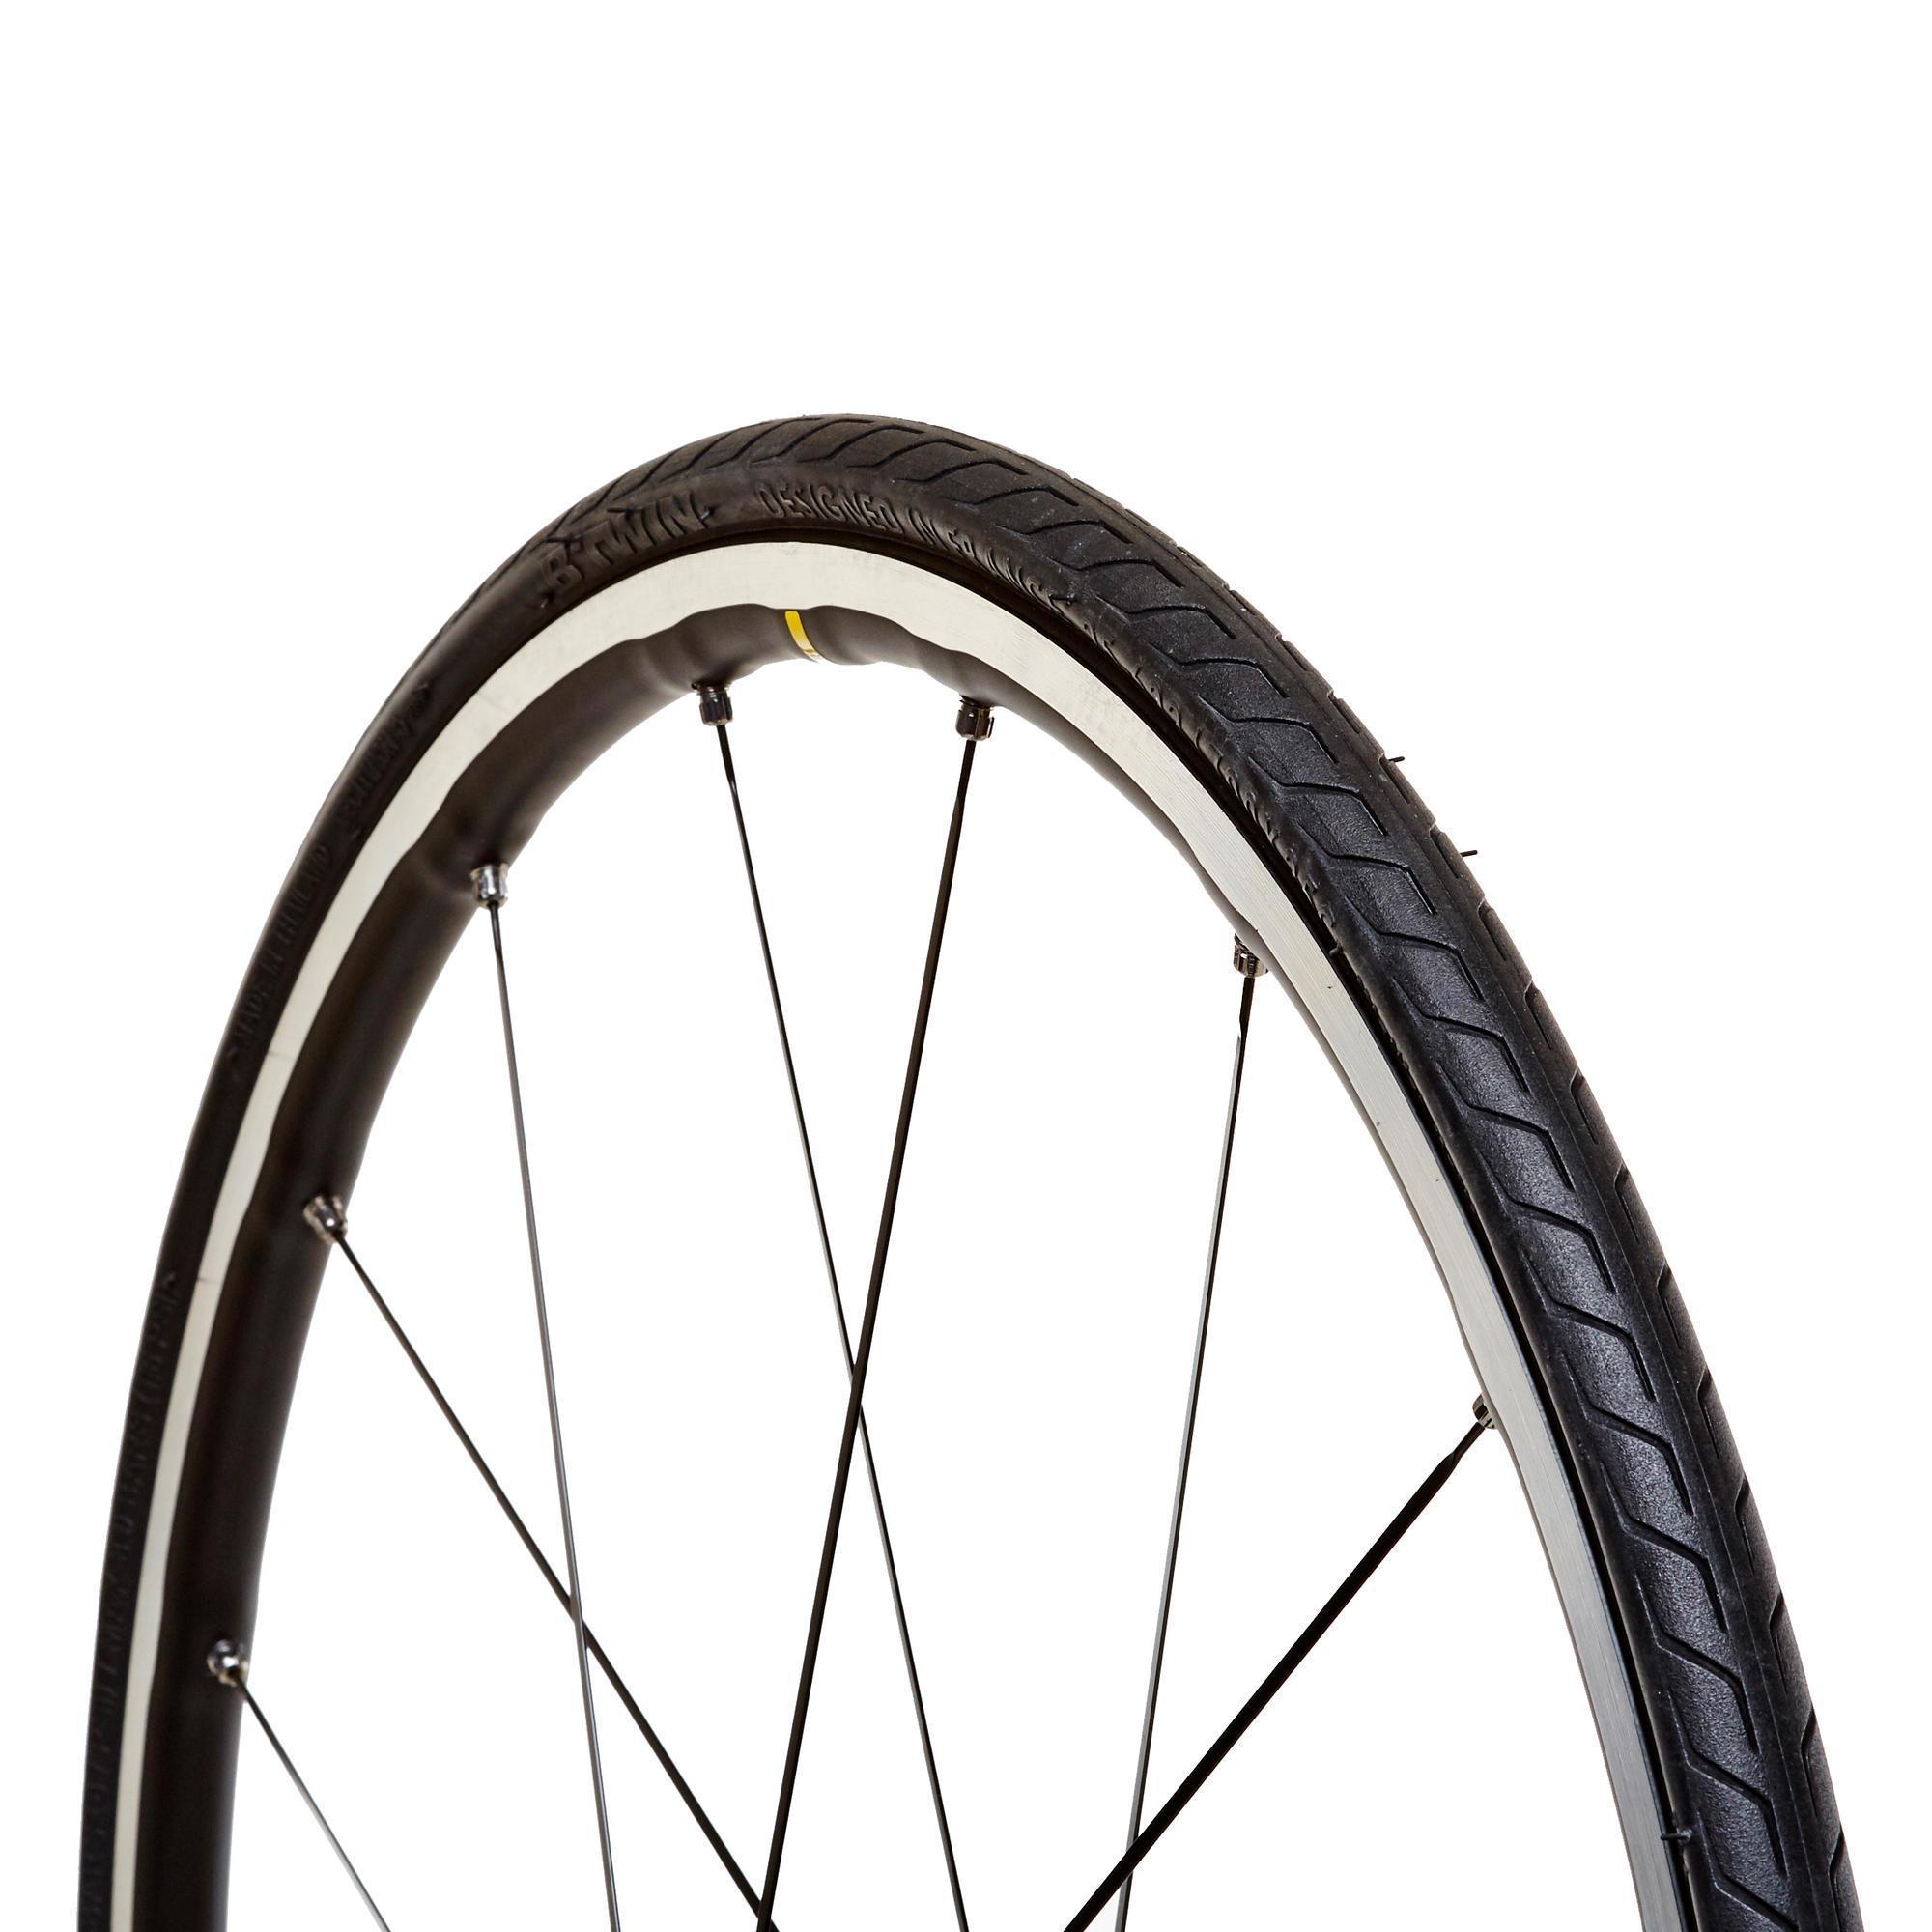 700 C vélo pneu pneus Michelin Dynamic Classique Fil 700x28c Tan wall